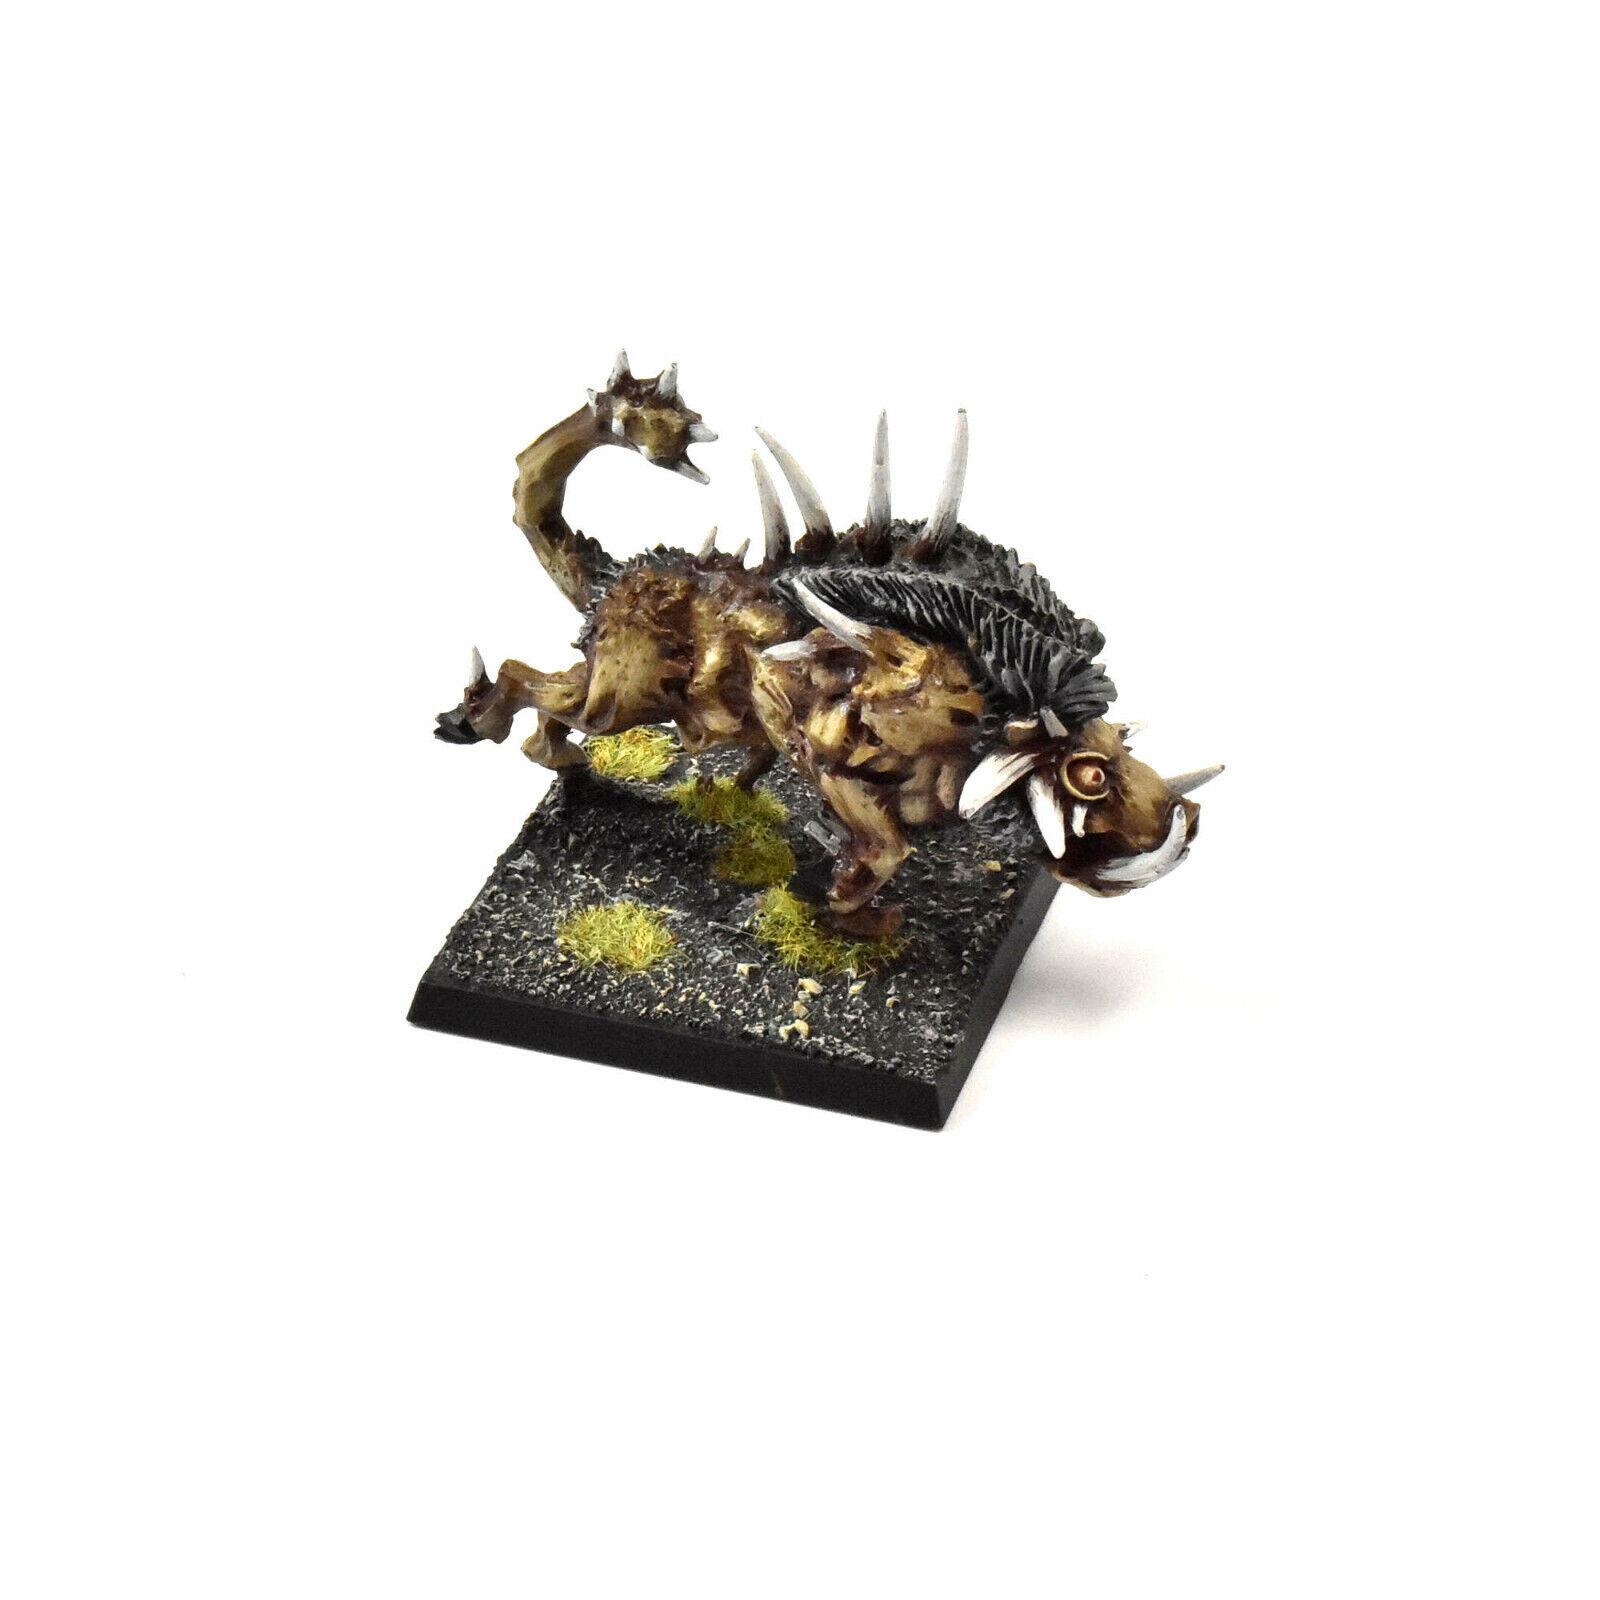 BEASTS OF CHAOS razorgor  3 PRO PAINTED Warhammer Fantasy BeastSie METAL